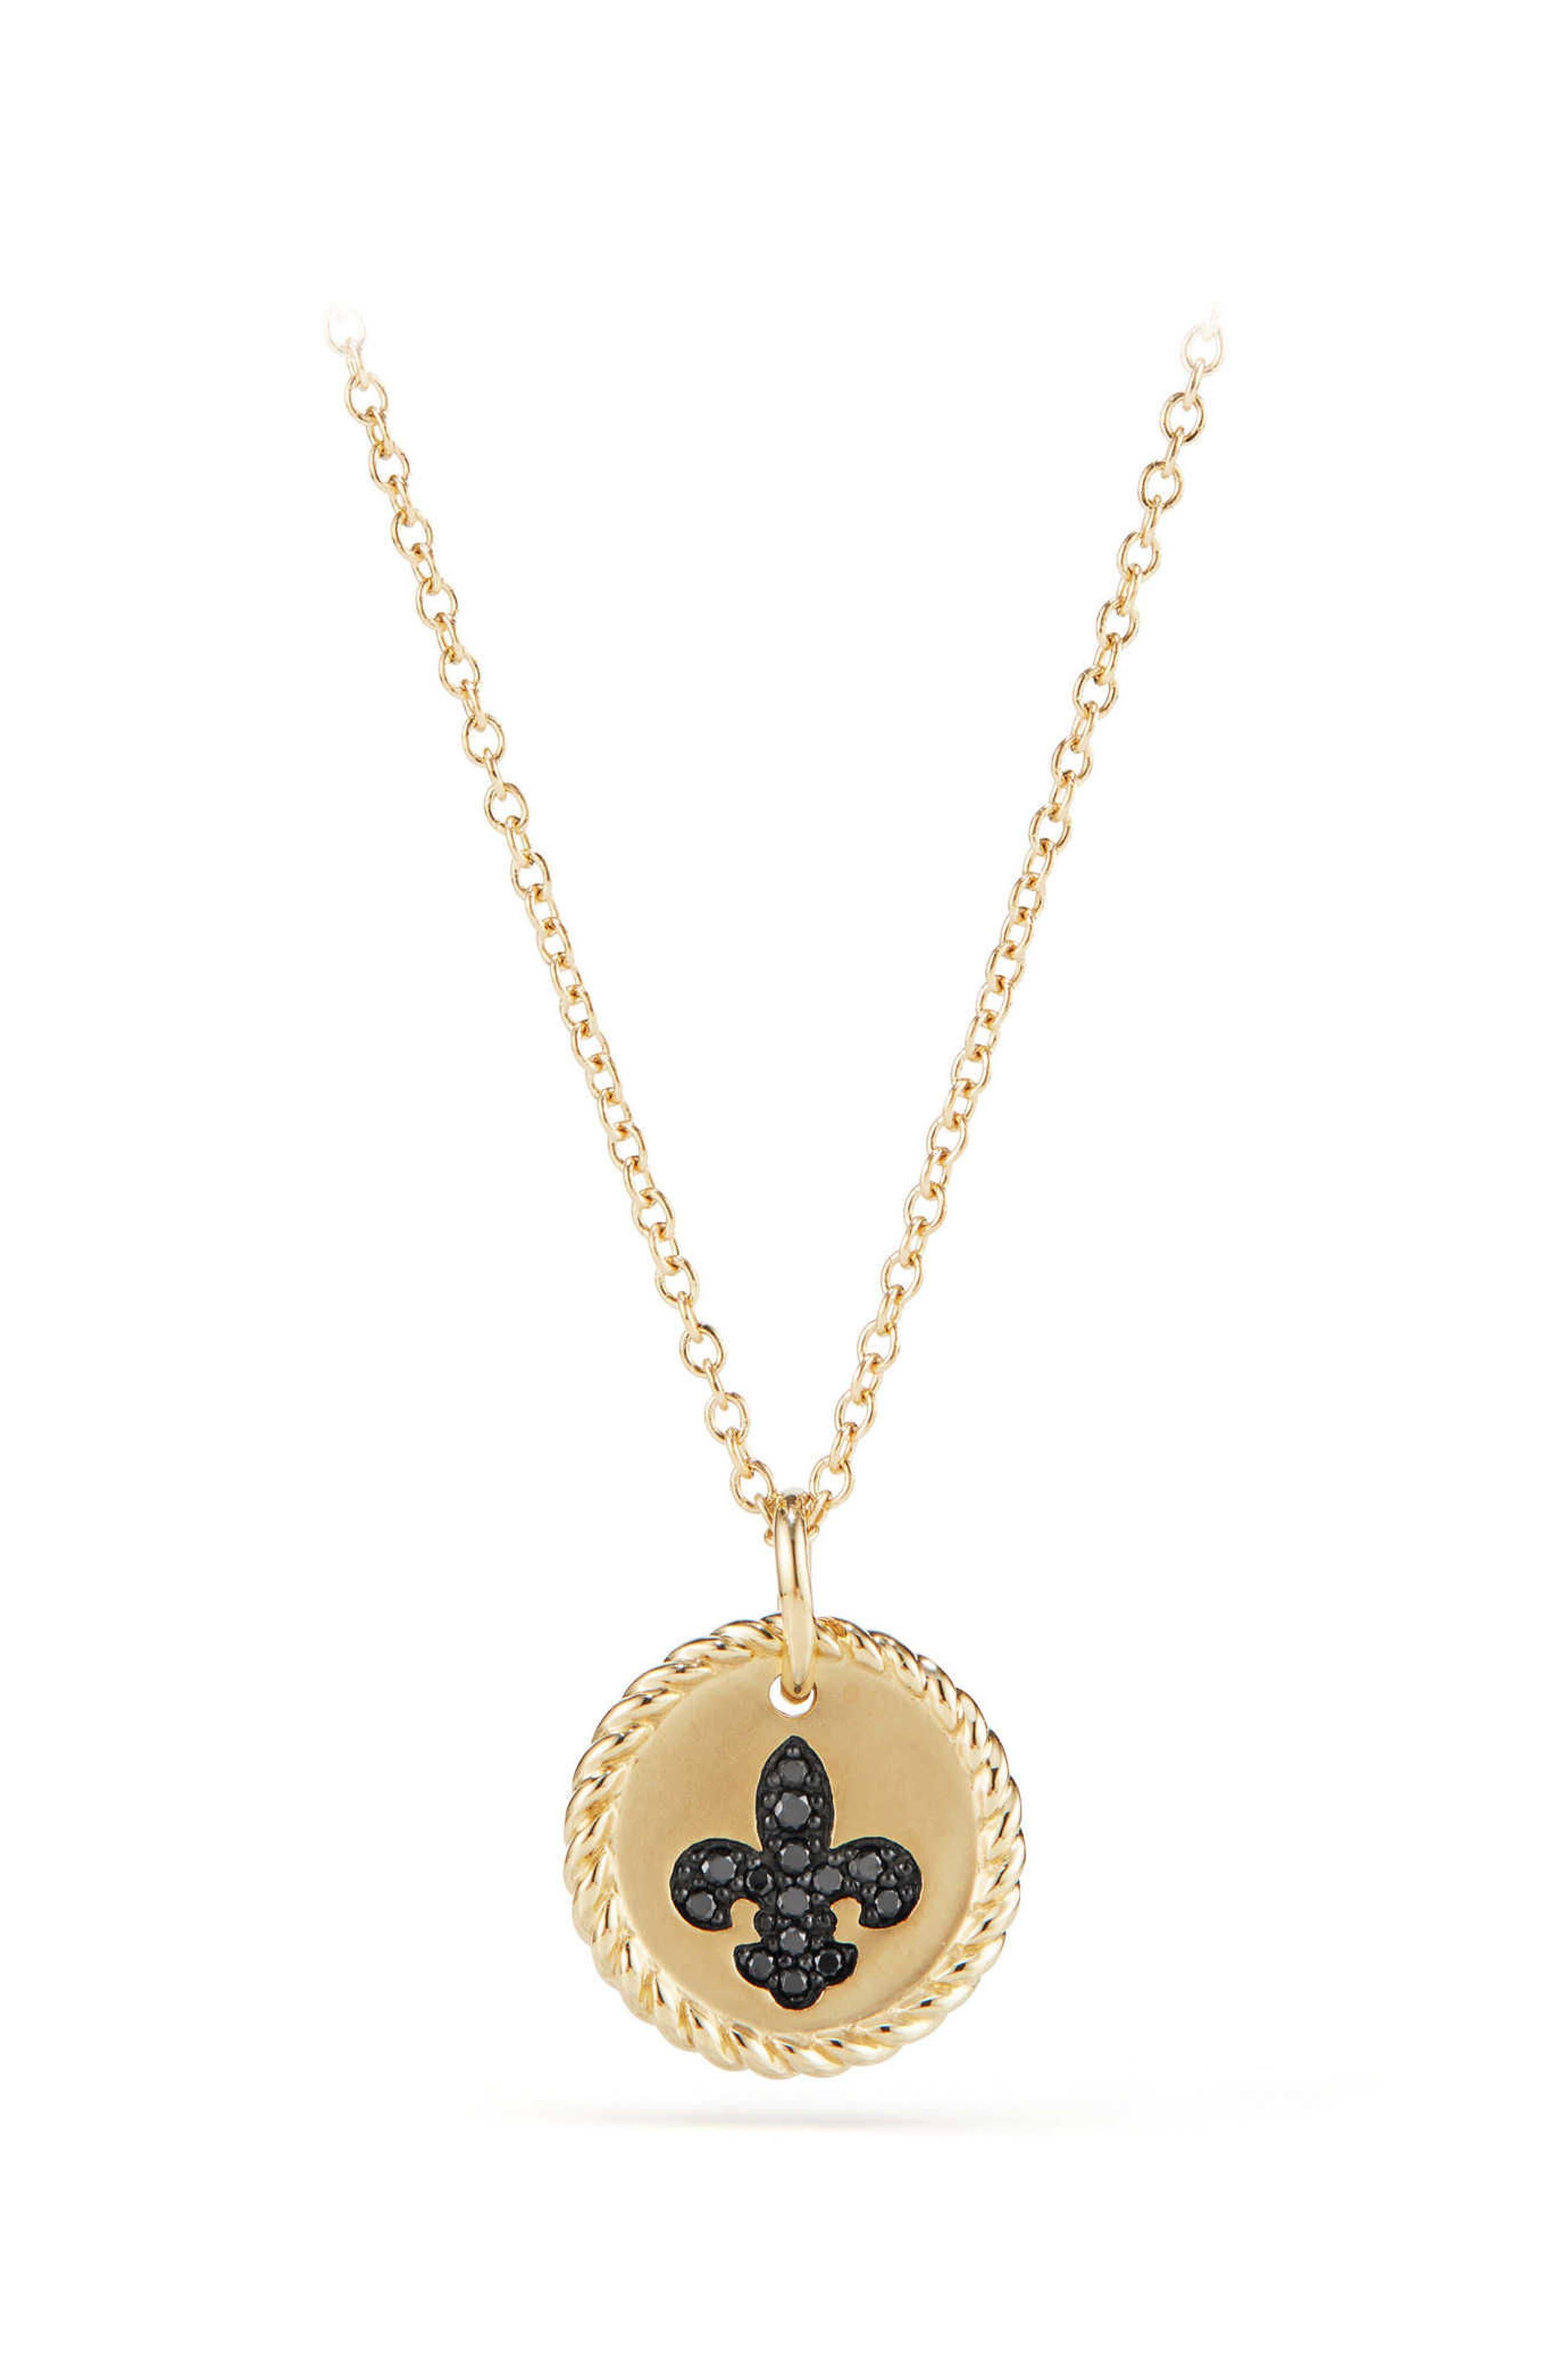 David Yurman Cable Collectibles Fleur de Lis Necklace with Black Diamonds in 18K Gold